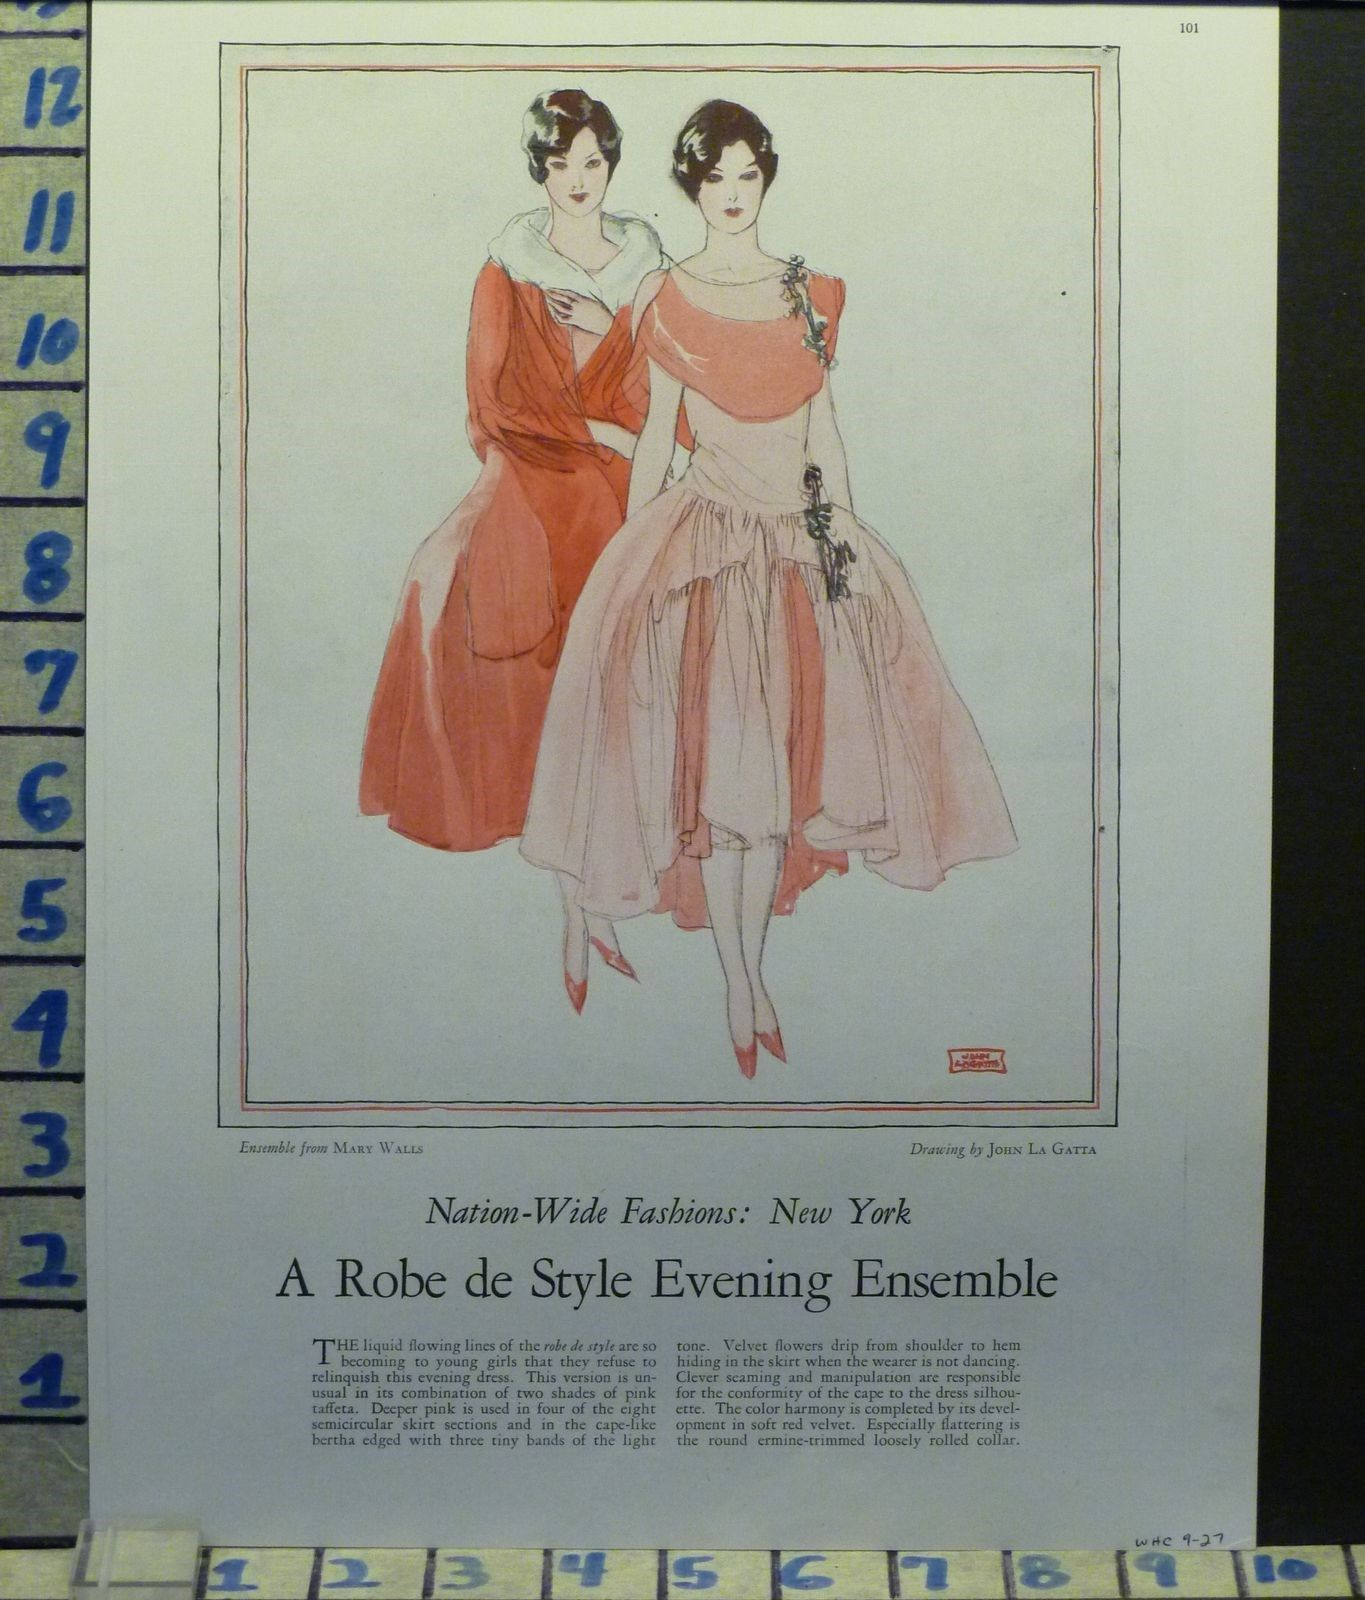 1920s fashion ad - Mary Walls design